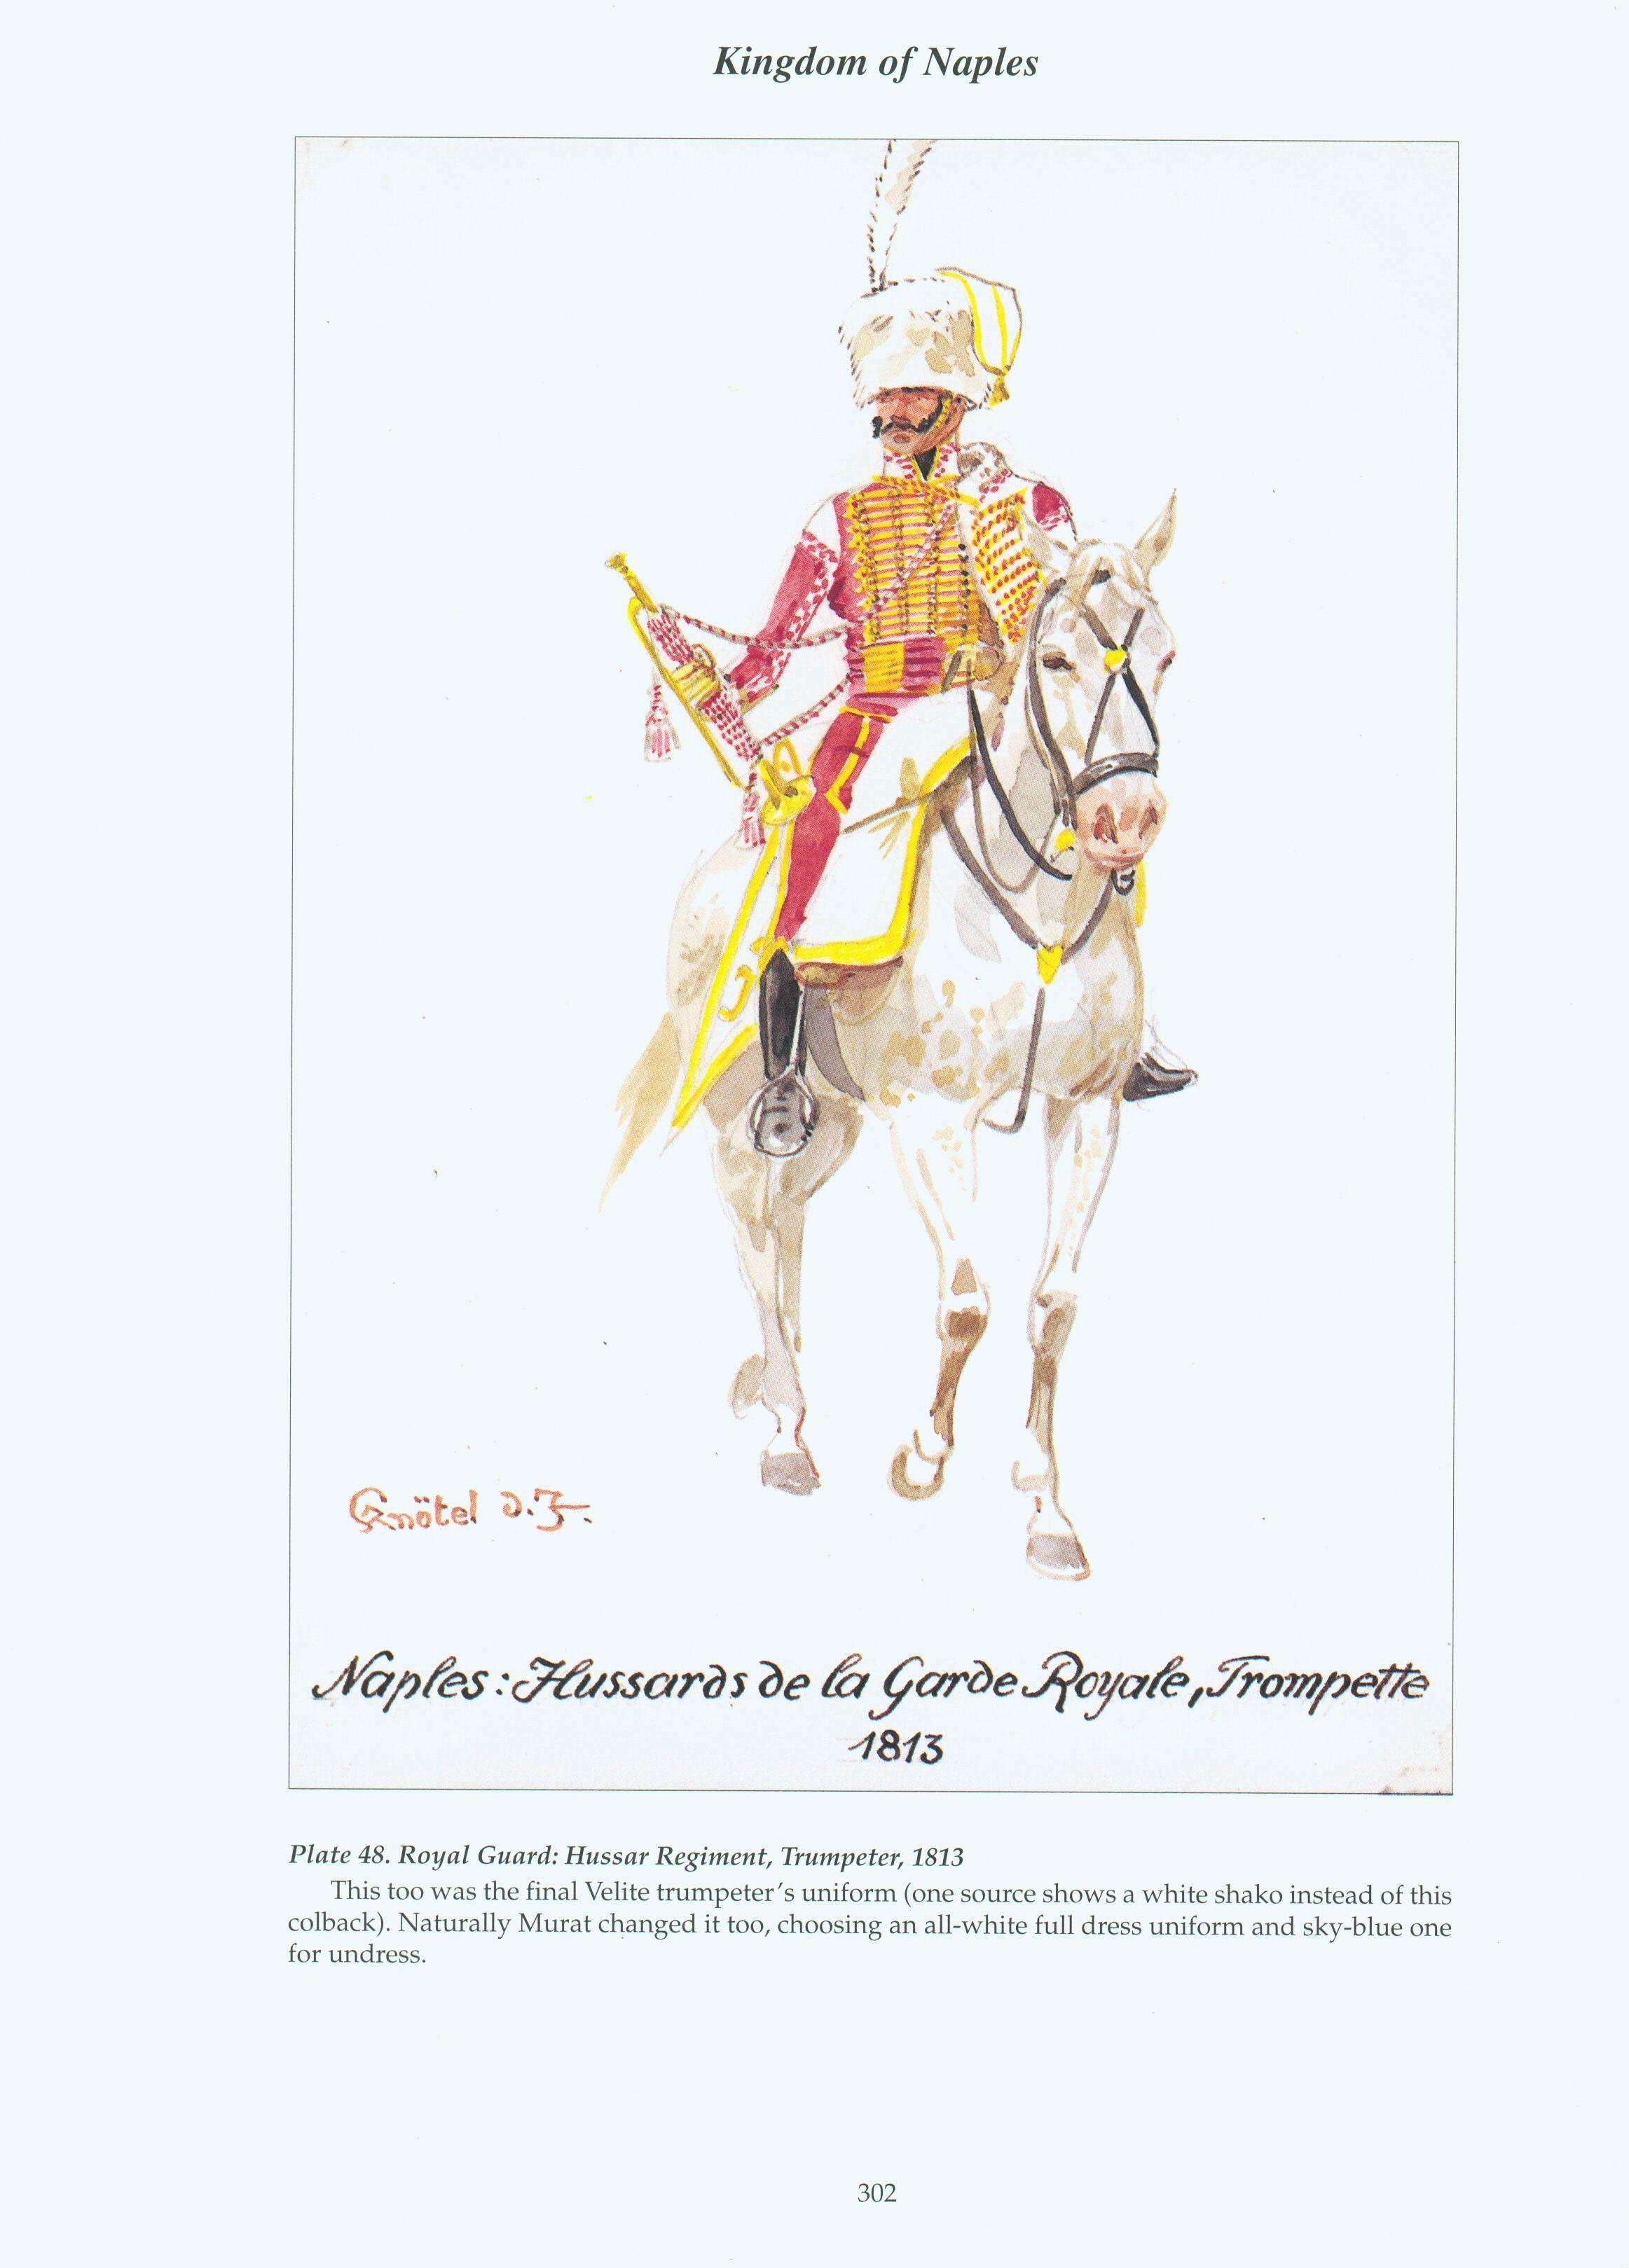 Kingdom of Naples: Plate 48: Royal Guard: Hussar Regiment, Trumpeter, 1813.